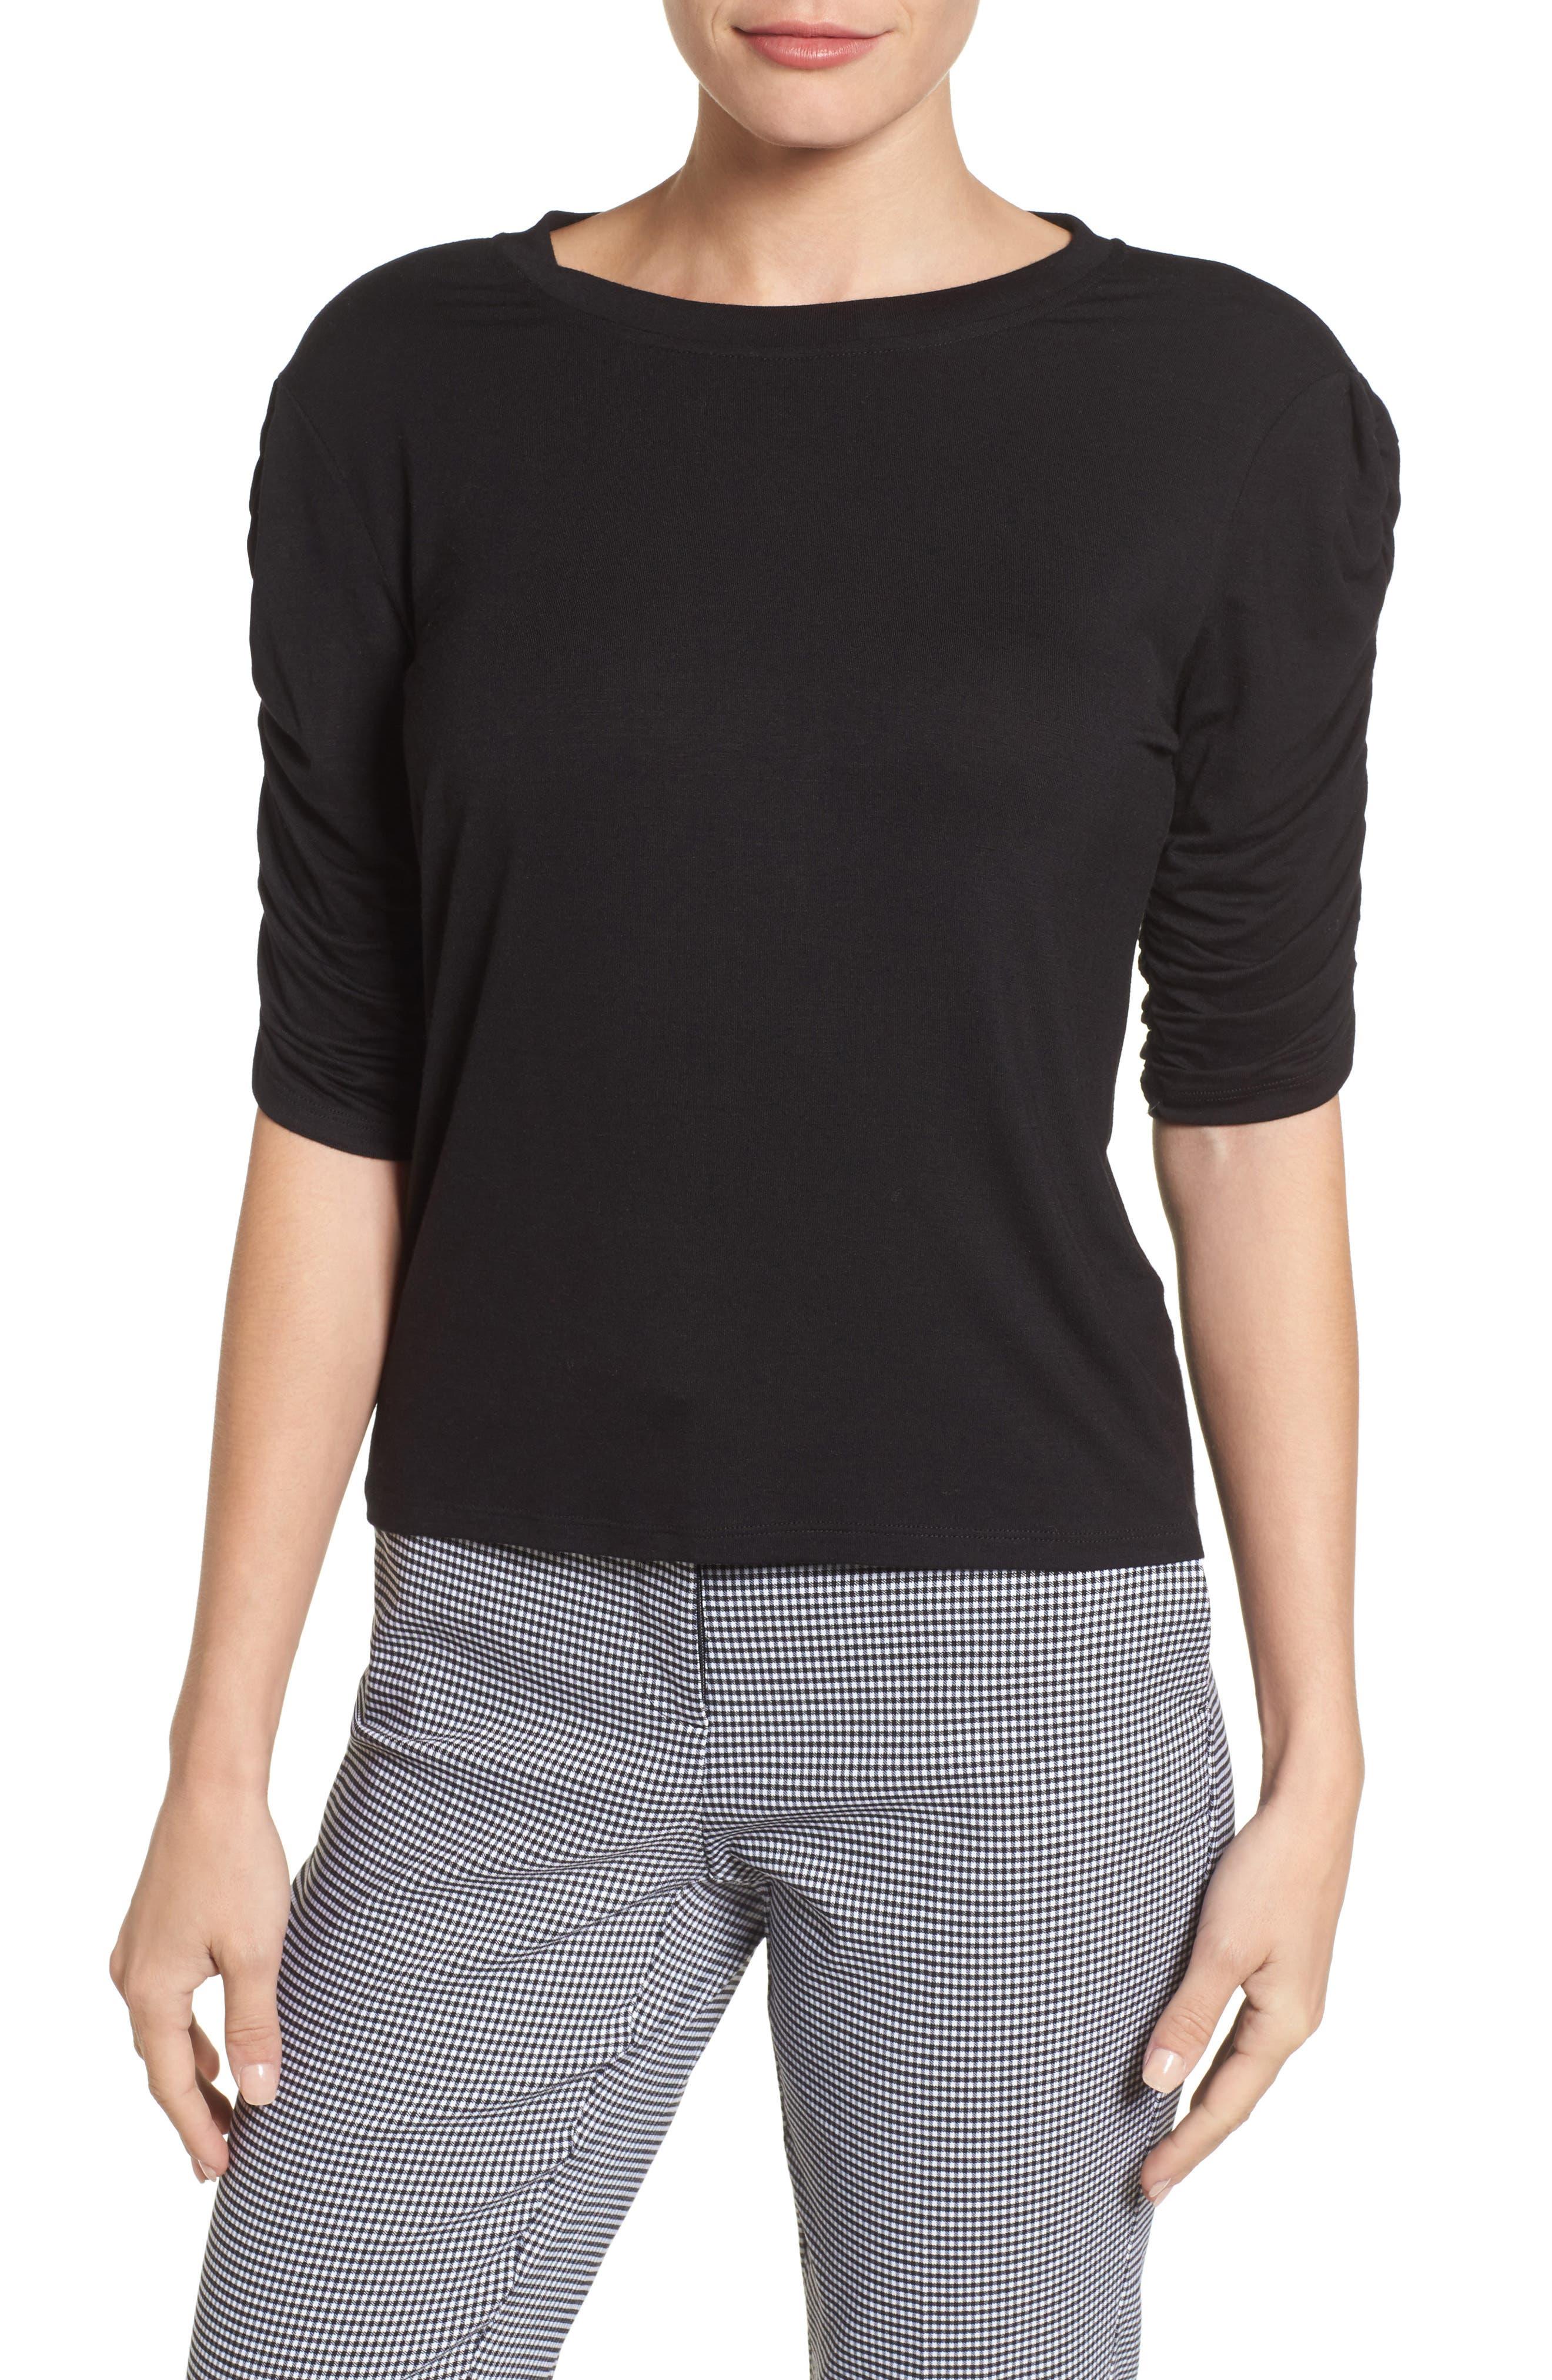 Cinch Sleeve Tee,                         Main,                         color, Black